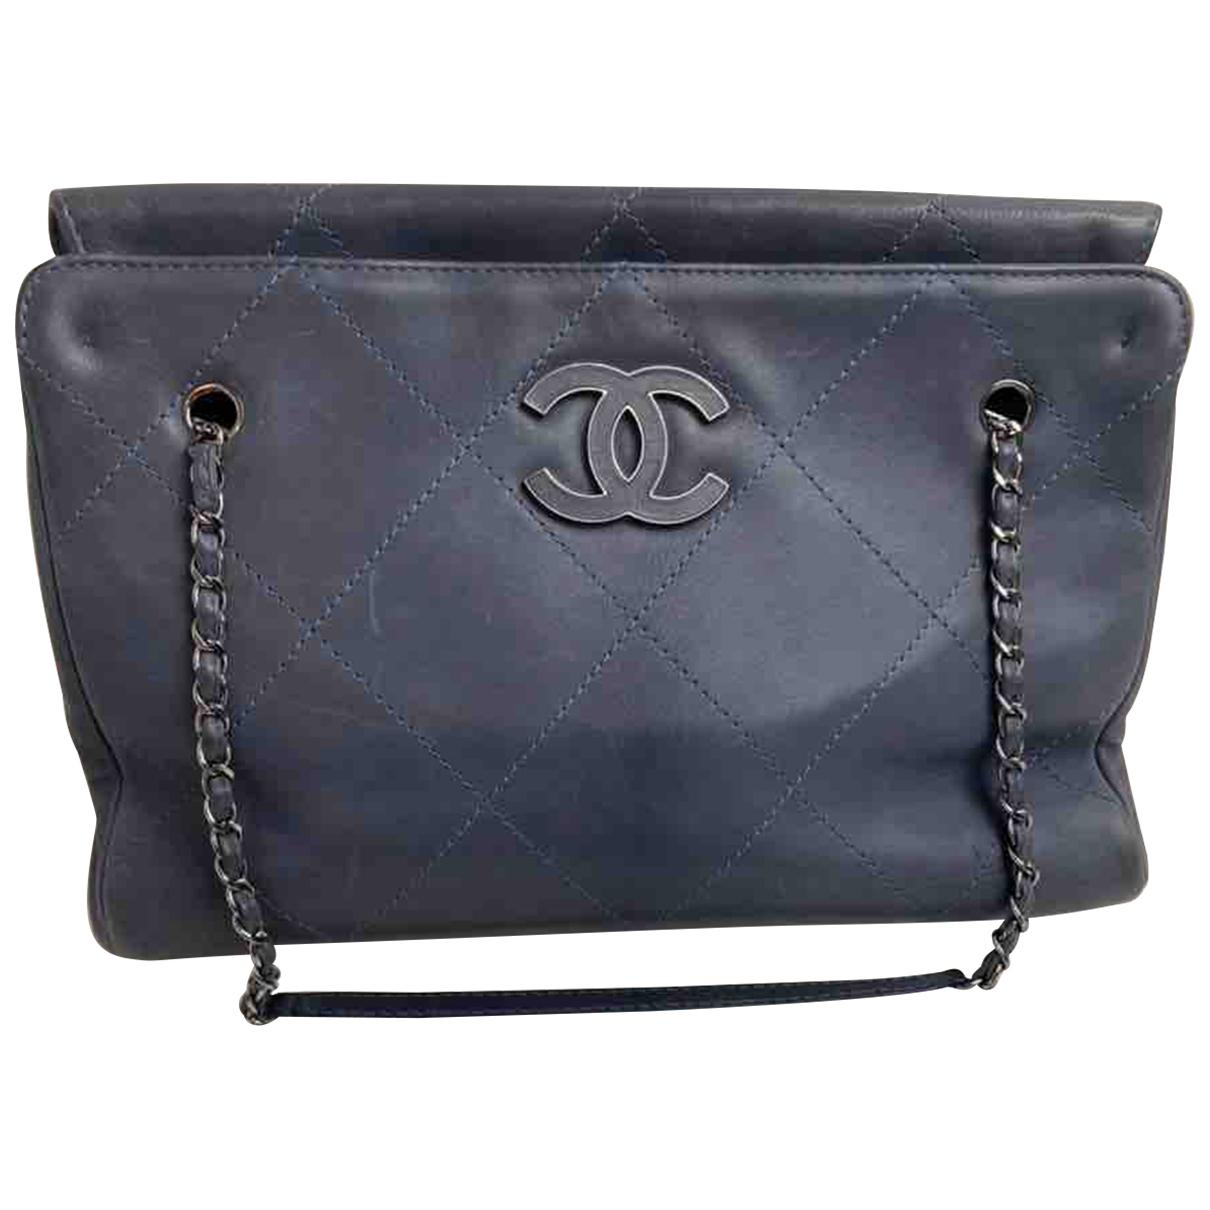 Chanel Grand shopping Handtasche in  Grau Leder